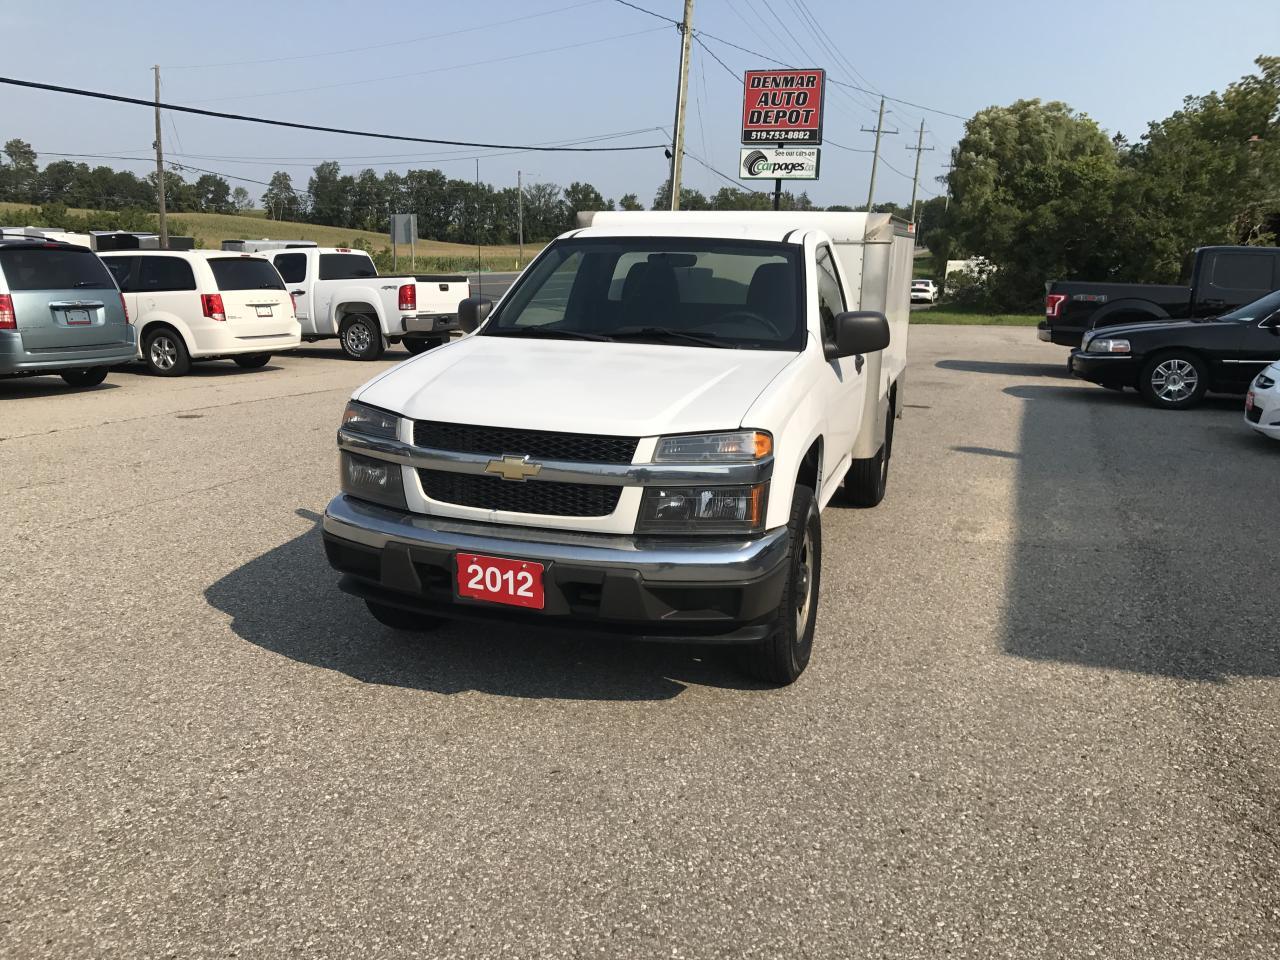 Photo of White 2012 Chevrolet Colorado